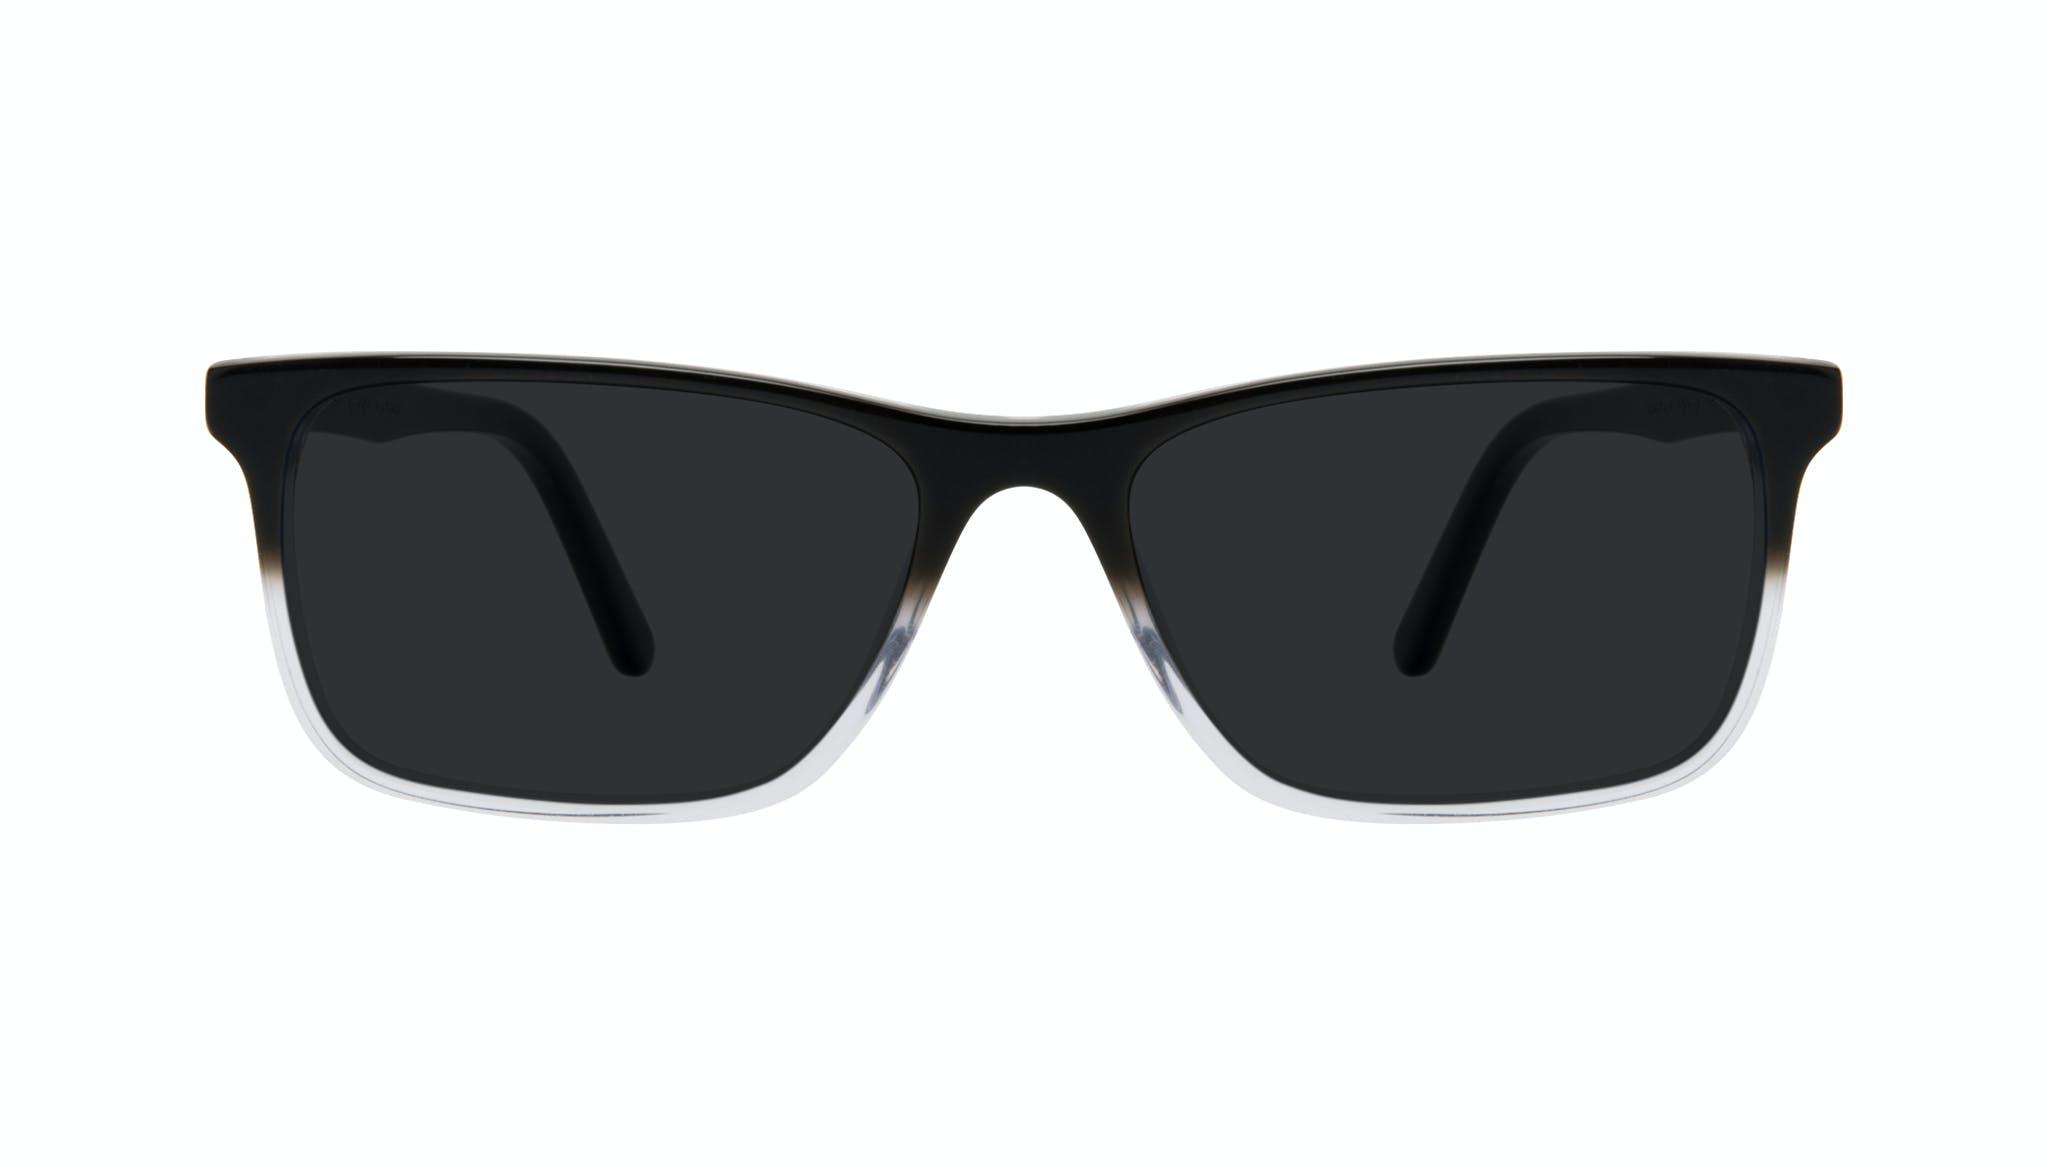 Affordable Fashion Glasses Rectangle Sunglasses Men Henri Onyx Clear Front